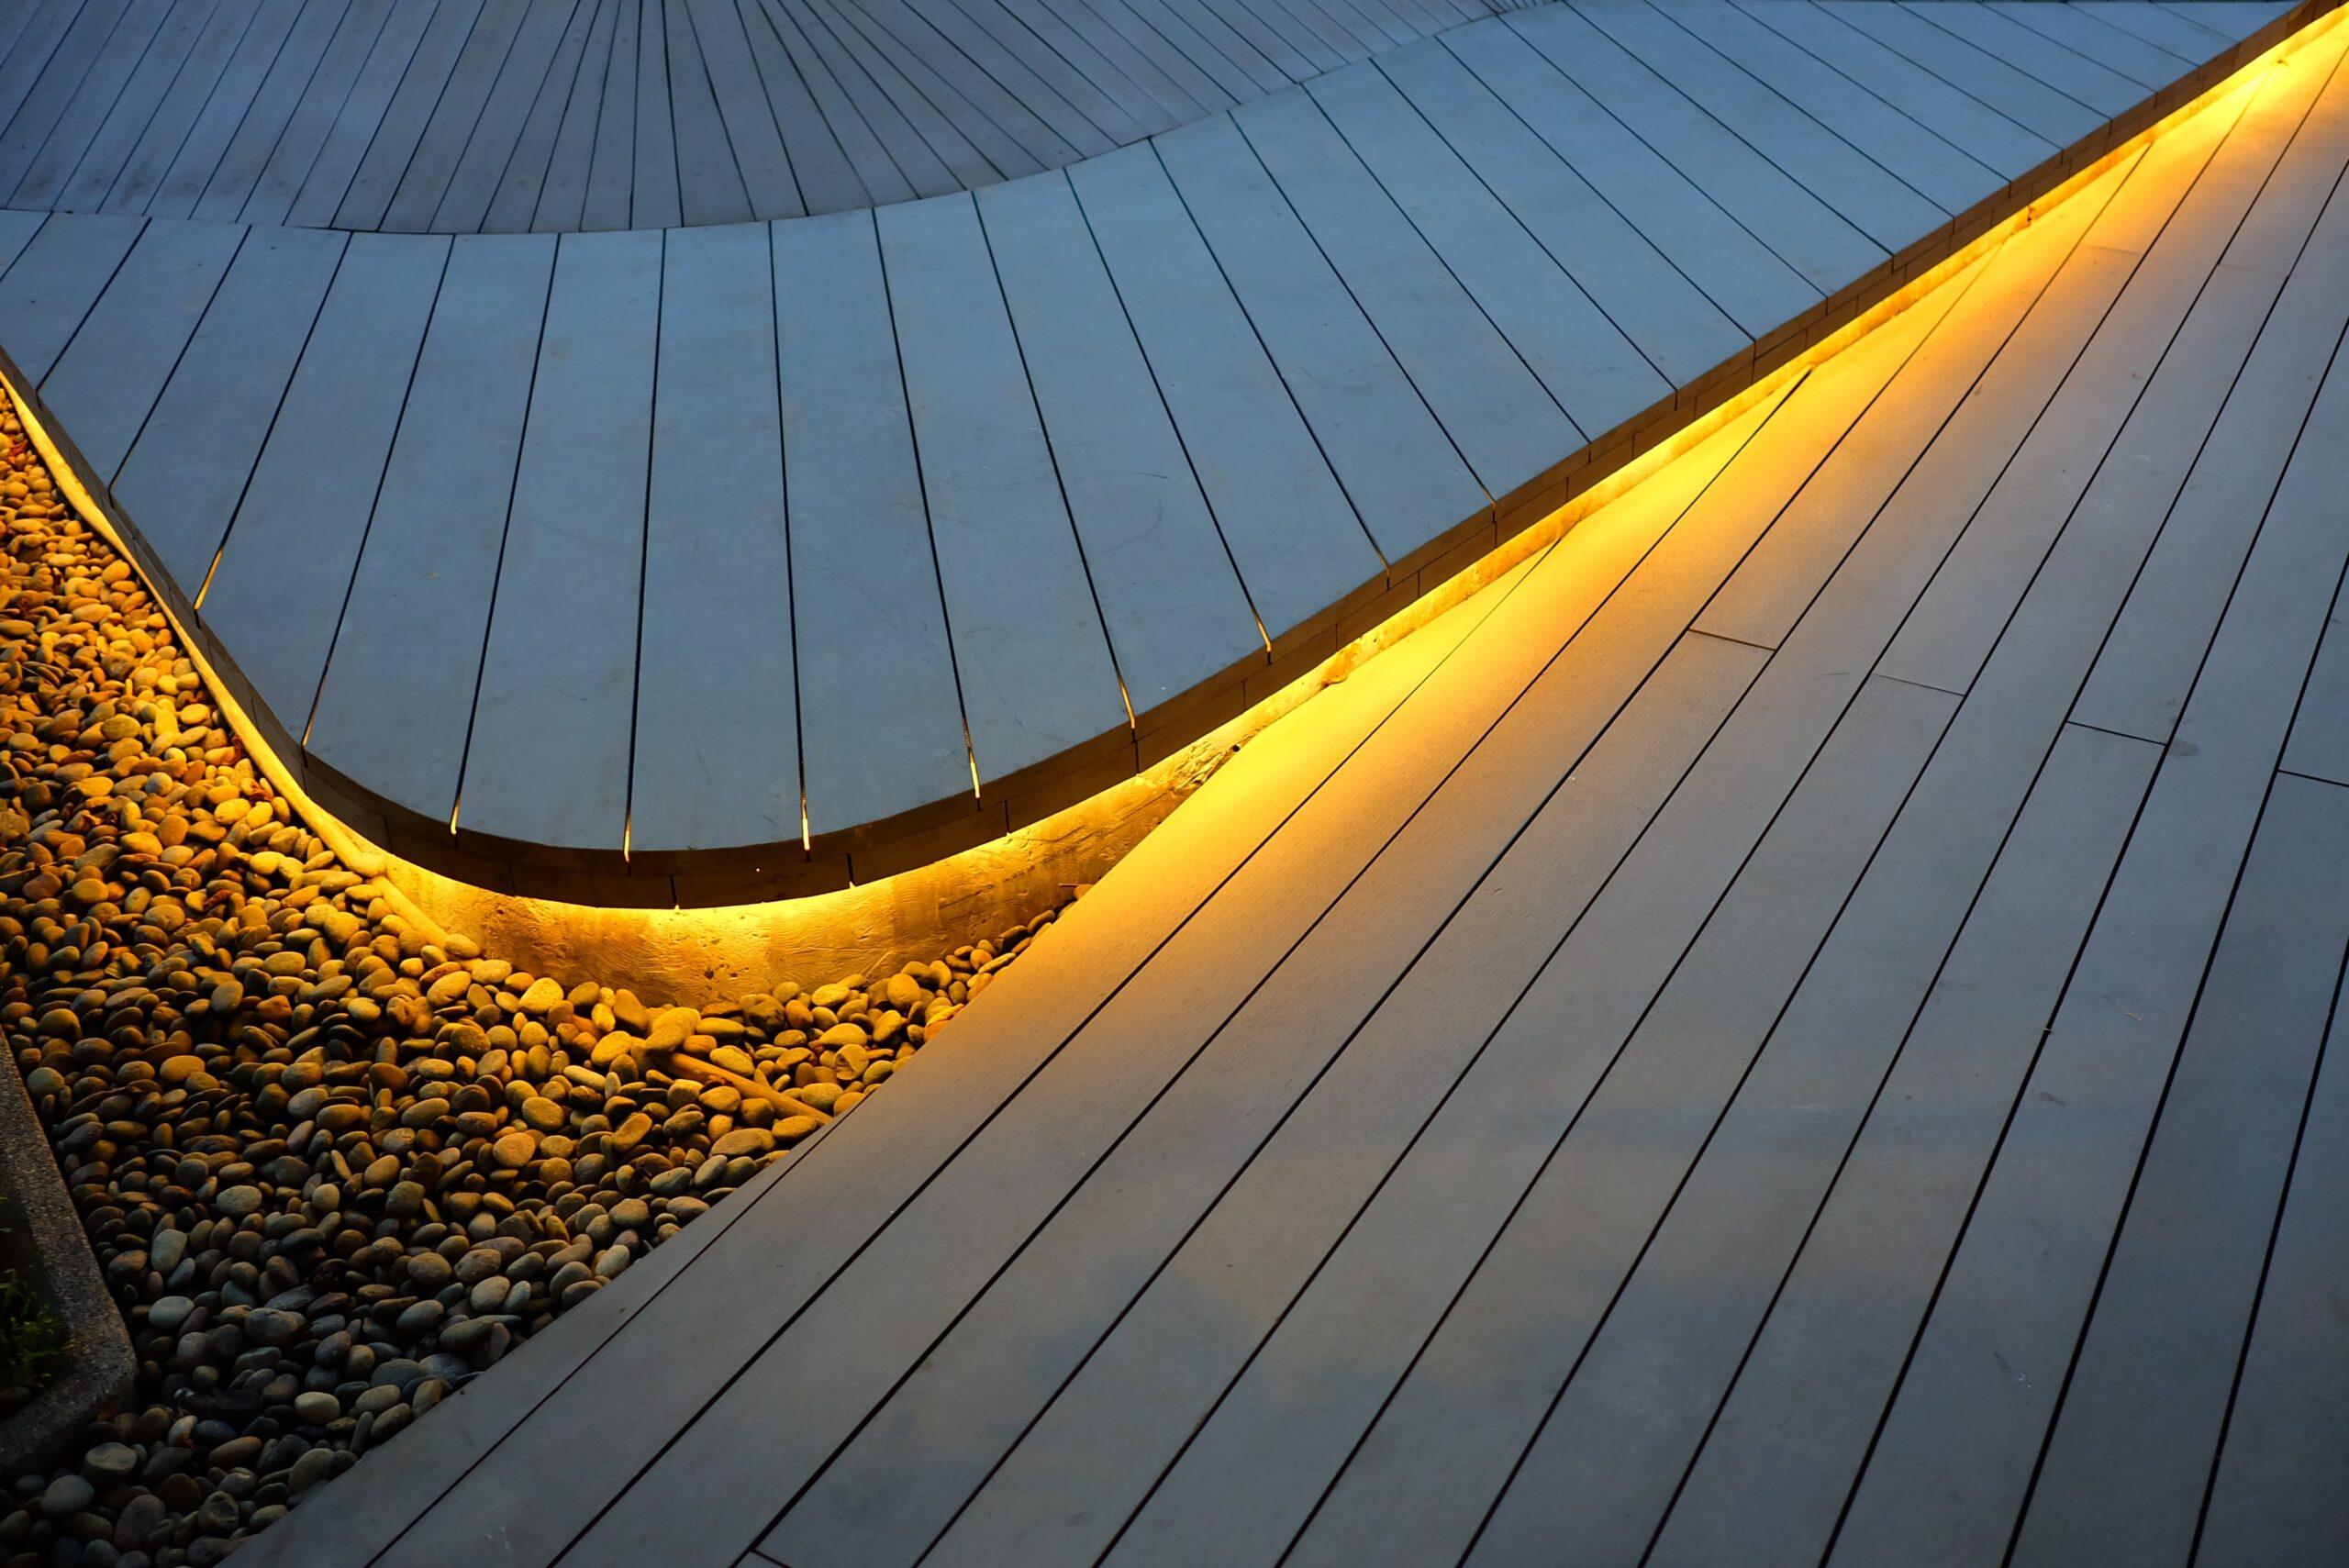 outdoor living backyard integrated with weatherproof smart lighting